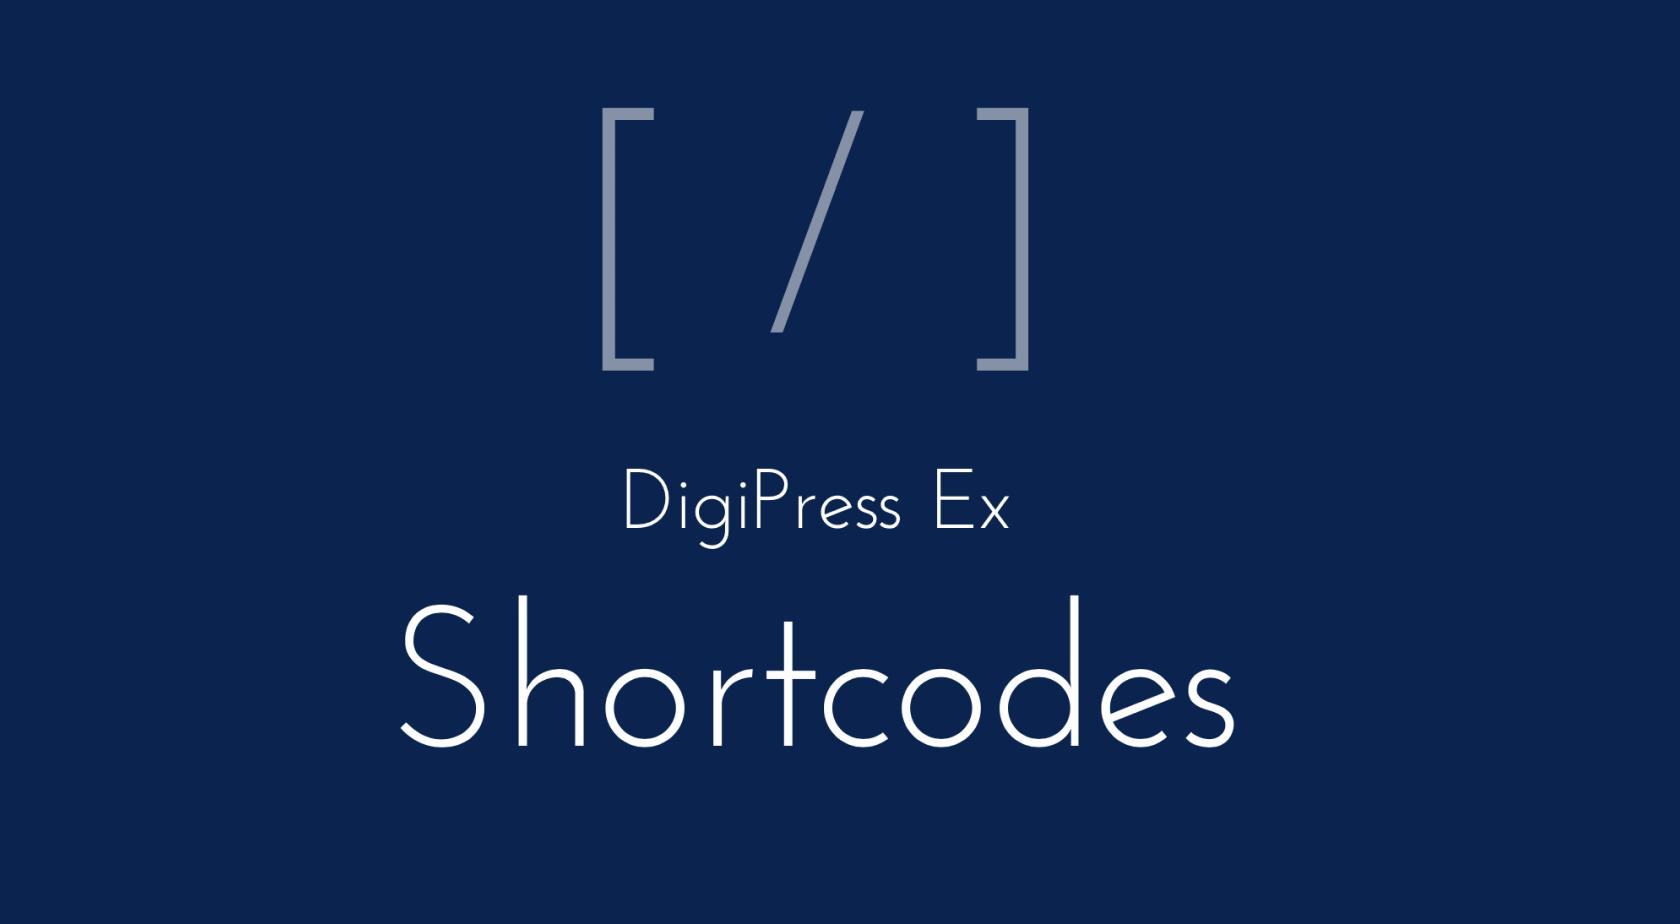 DigiPress Ex – Shortcodes : 実用的でレスポンシブ対応の豊富なショートコードを追加